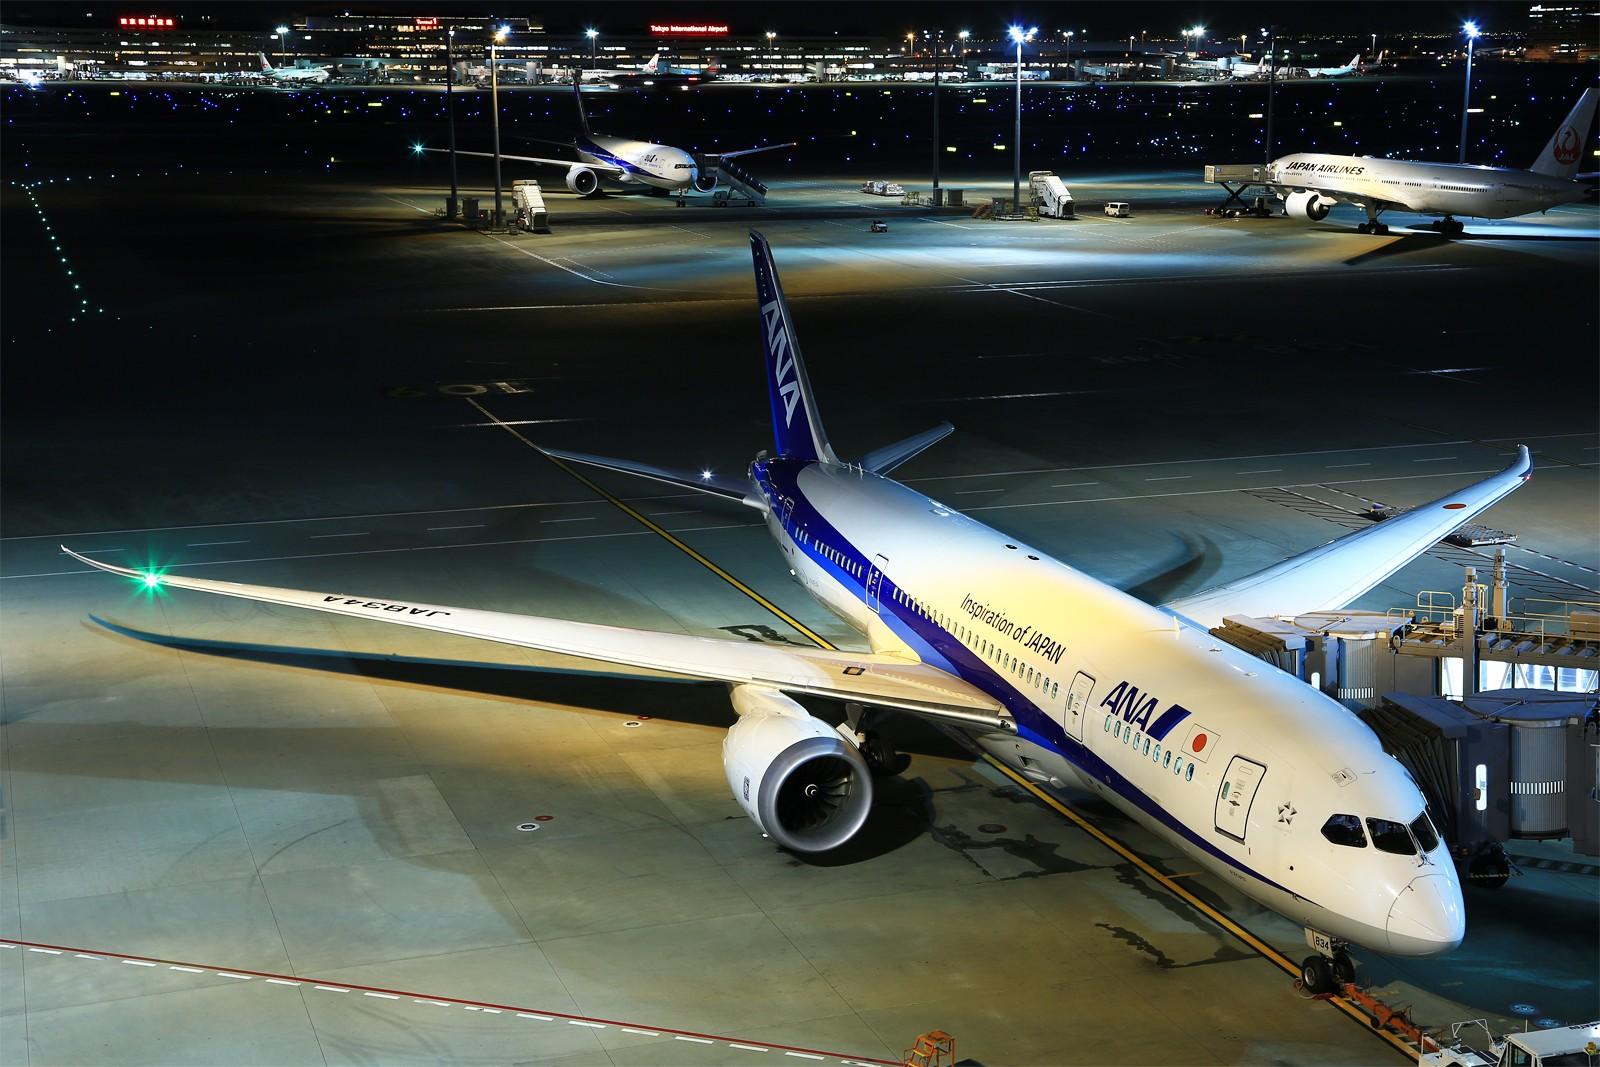 Re:[原创]【HND】******2016新年好,流窜羽田机场:全日空星战,汉莎1500th,以及一些大路货****** BOEING 787-8 JA834A 日本东京羽田国际机场